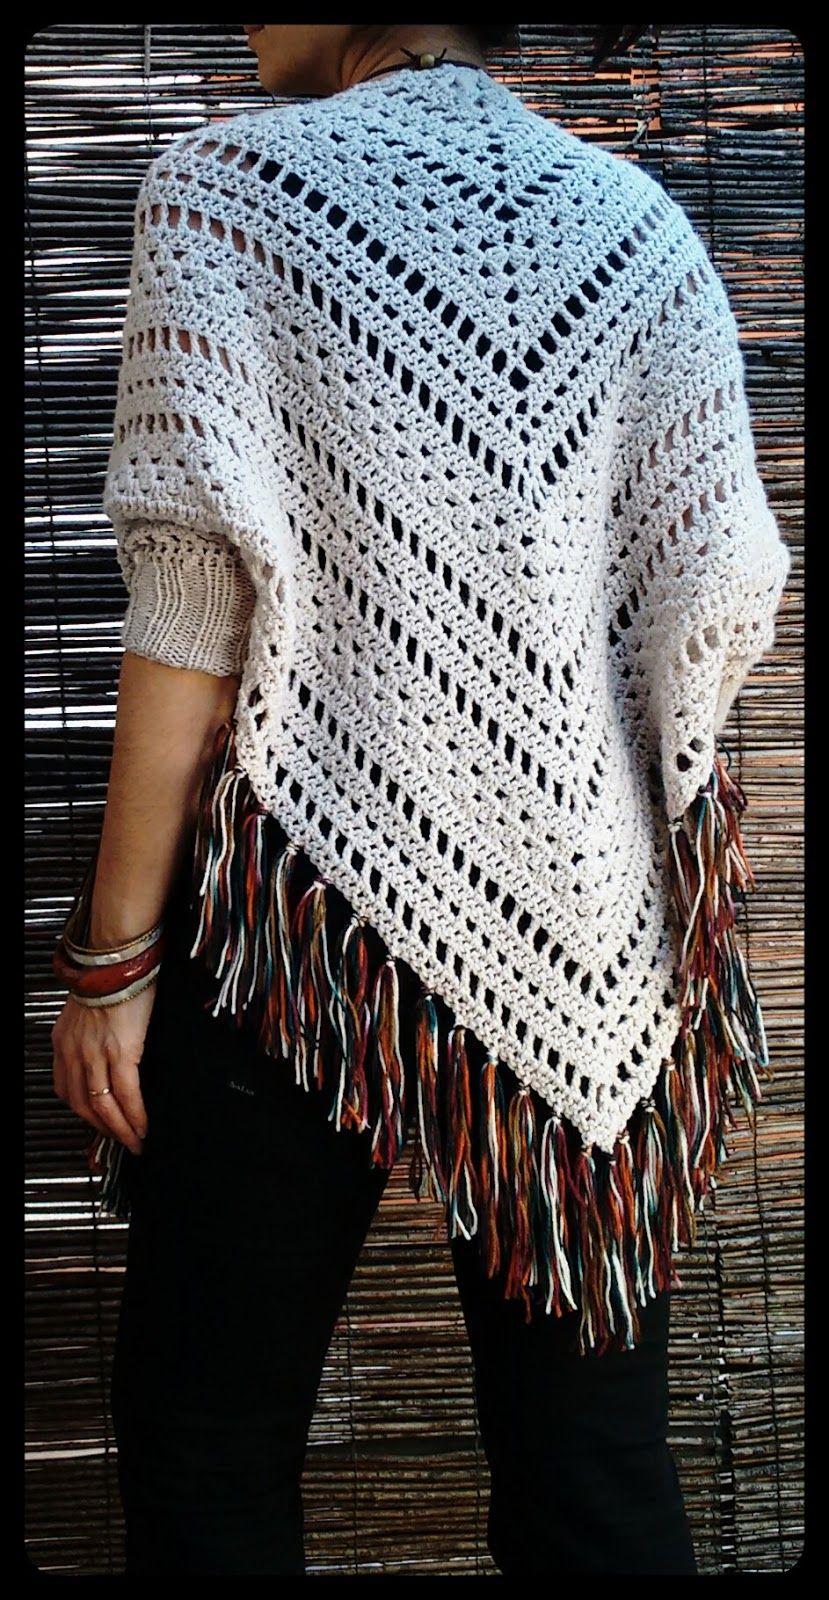 Crochet shawl with sleeves and fringe | Iara | Pinterest ...